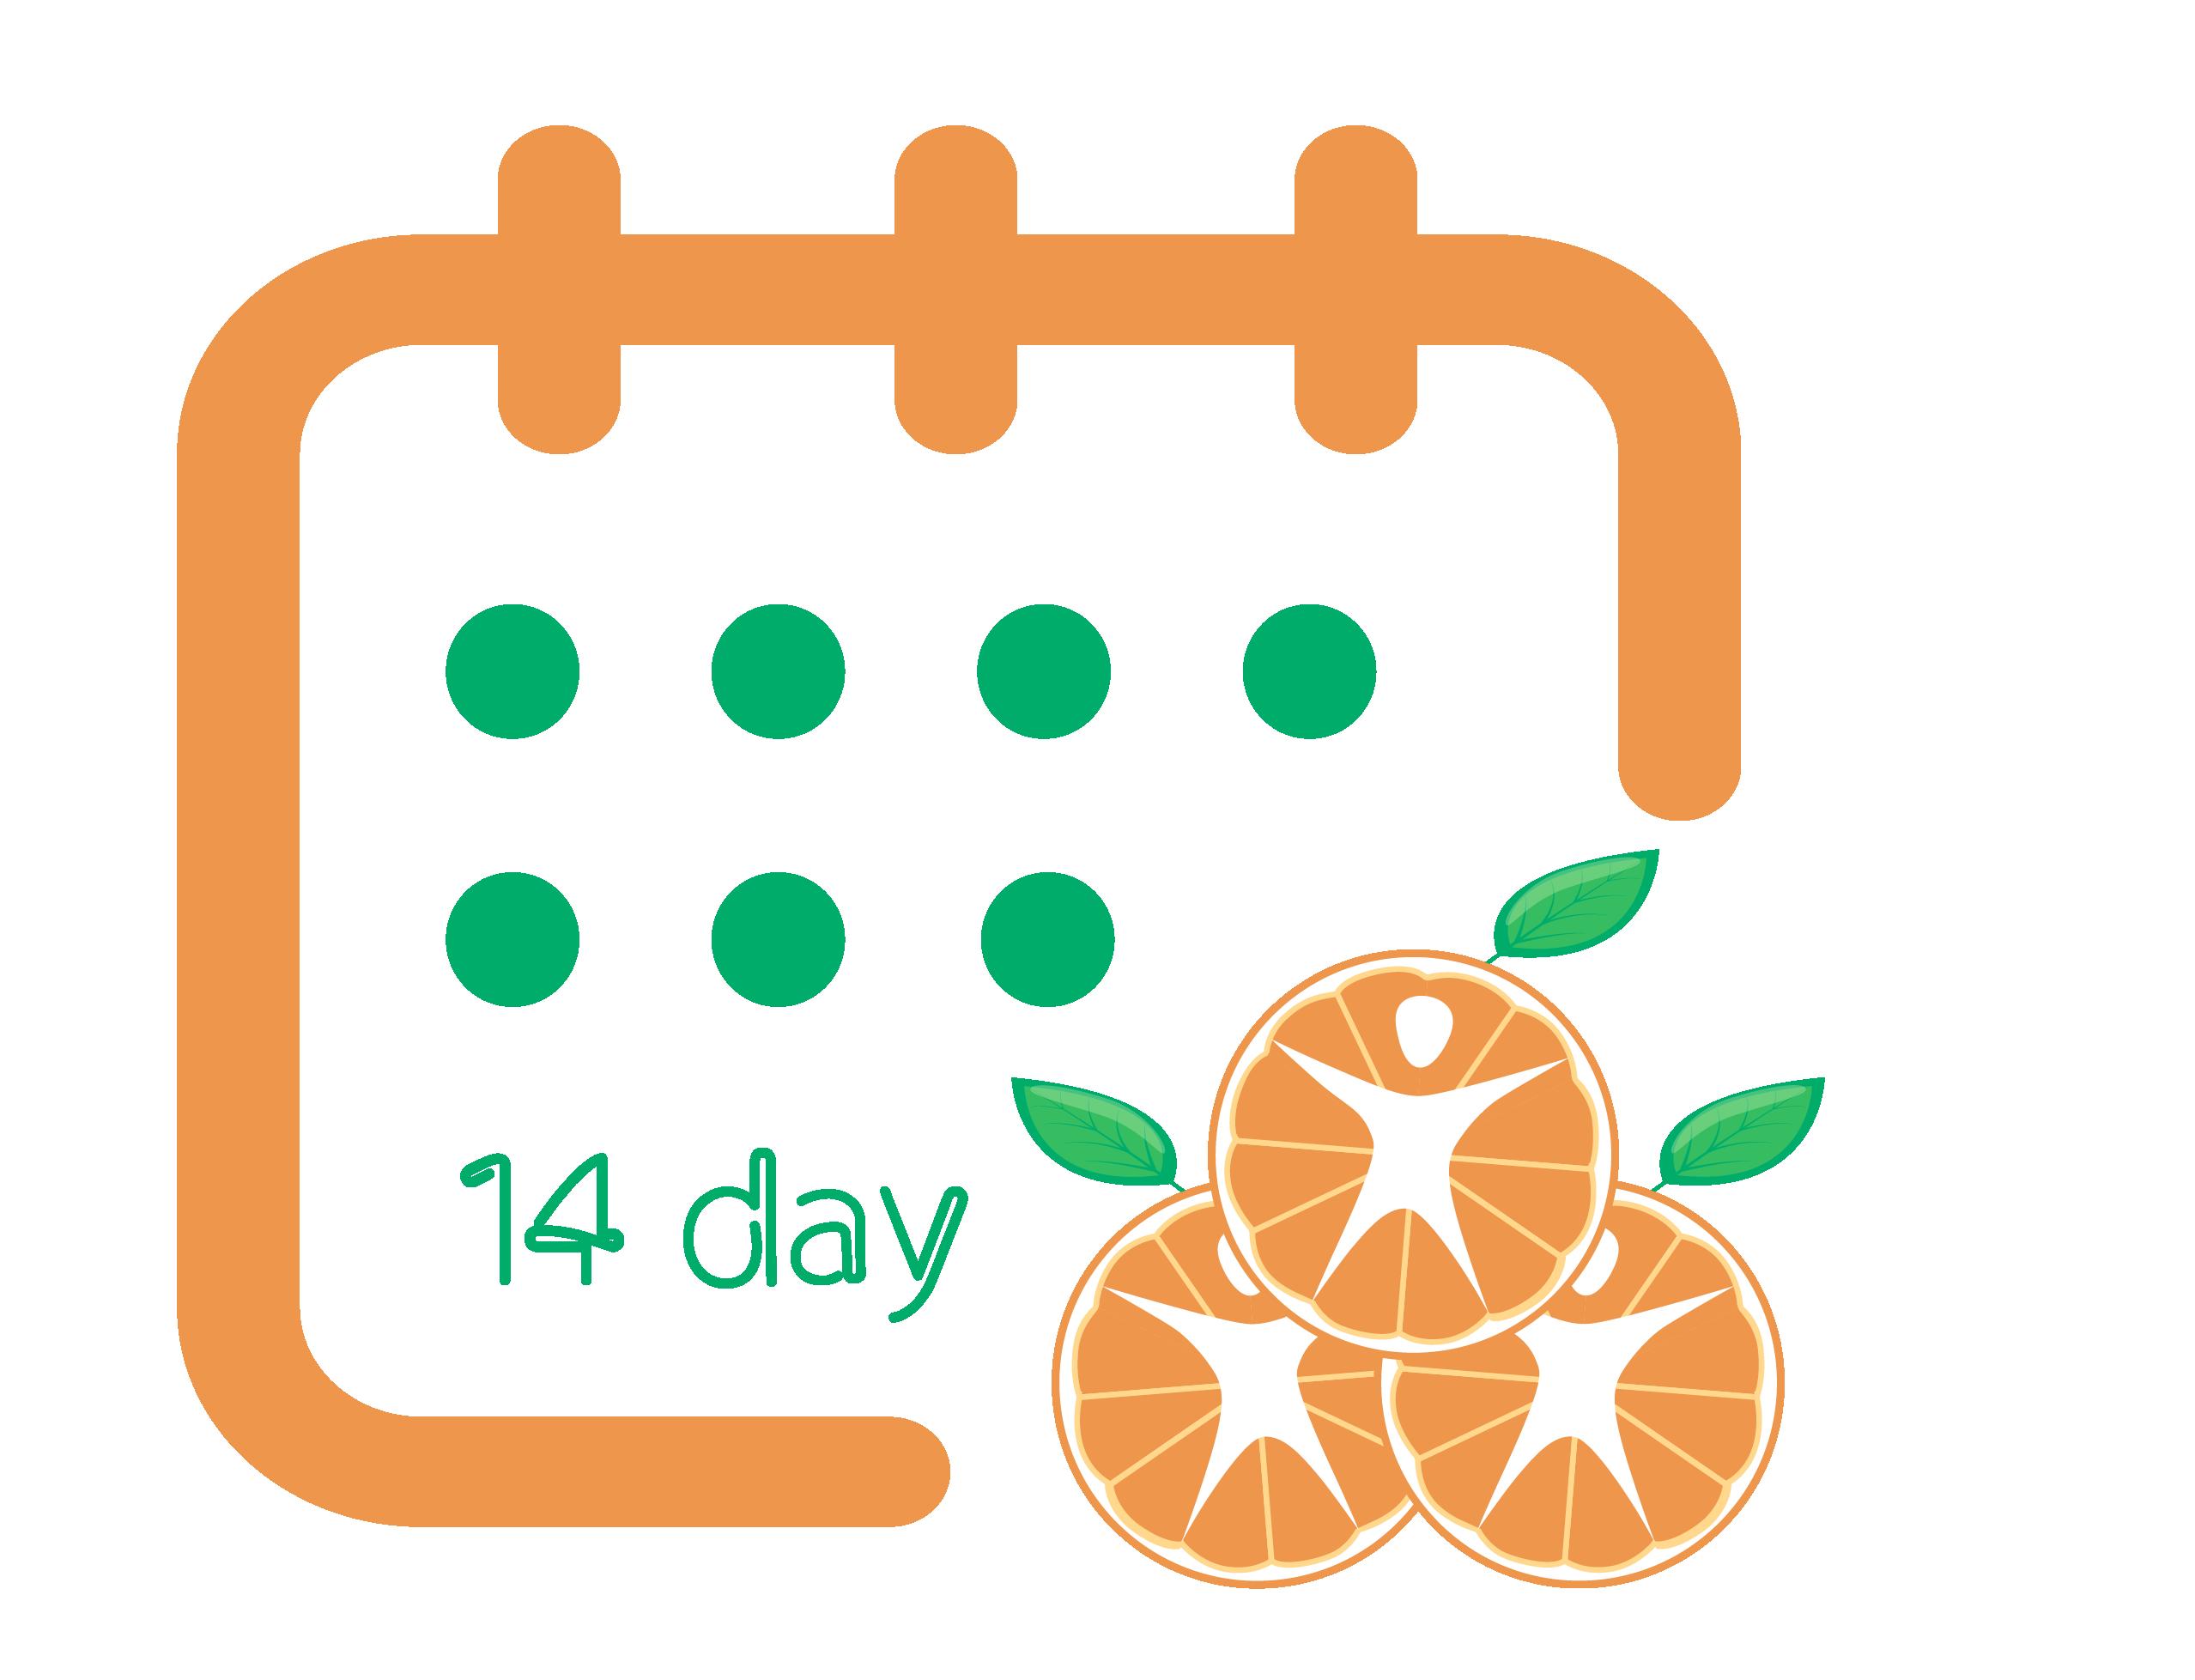 01.2_14 Day TRY WILDFIT Program